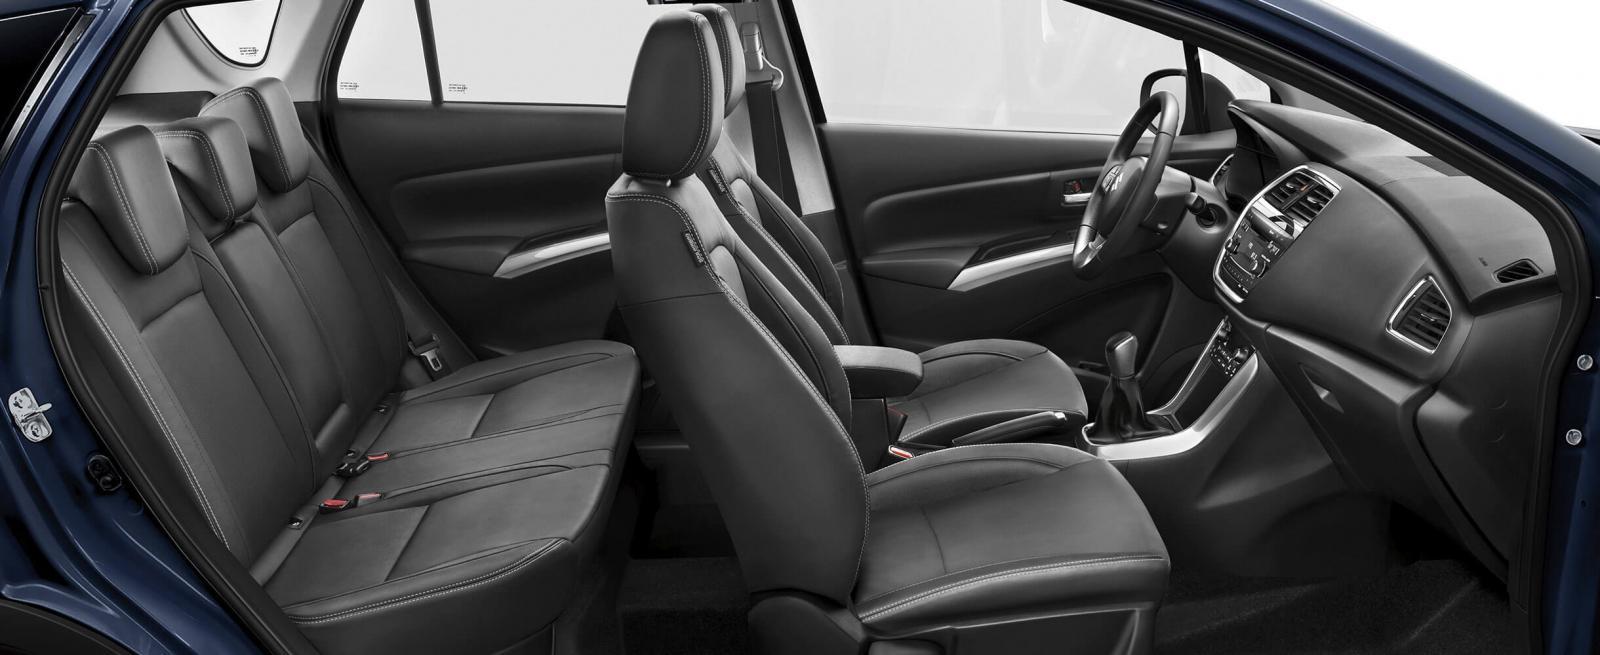 Suzuki S-Cross Boosterjet 2021 resena opiniones